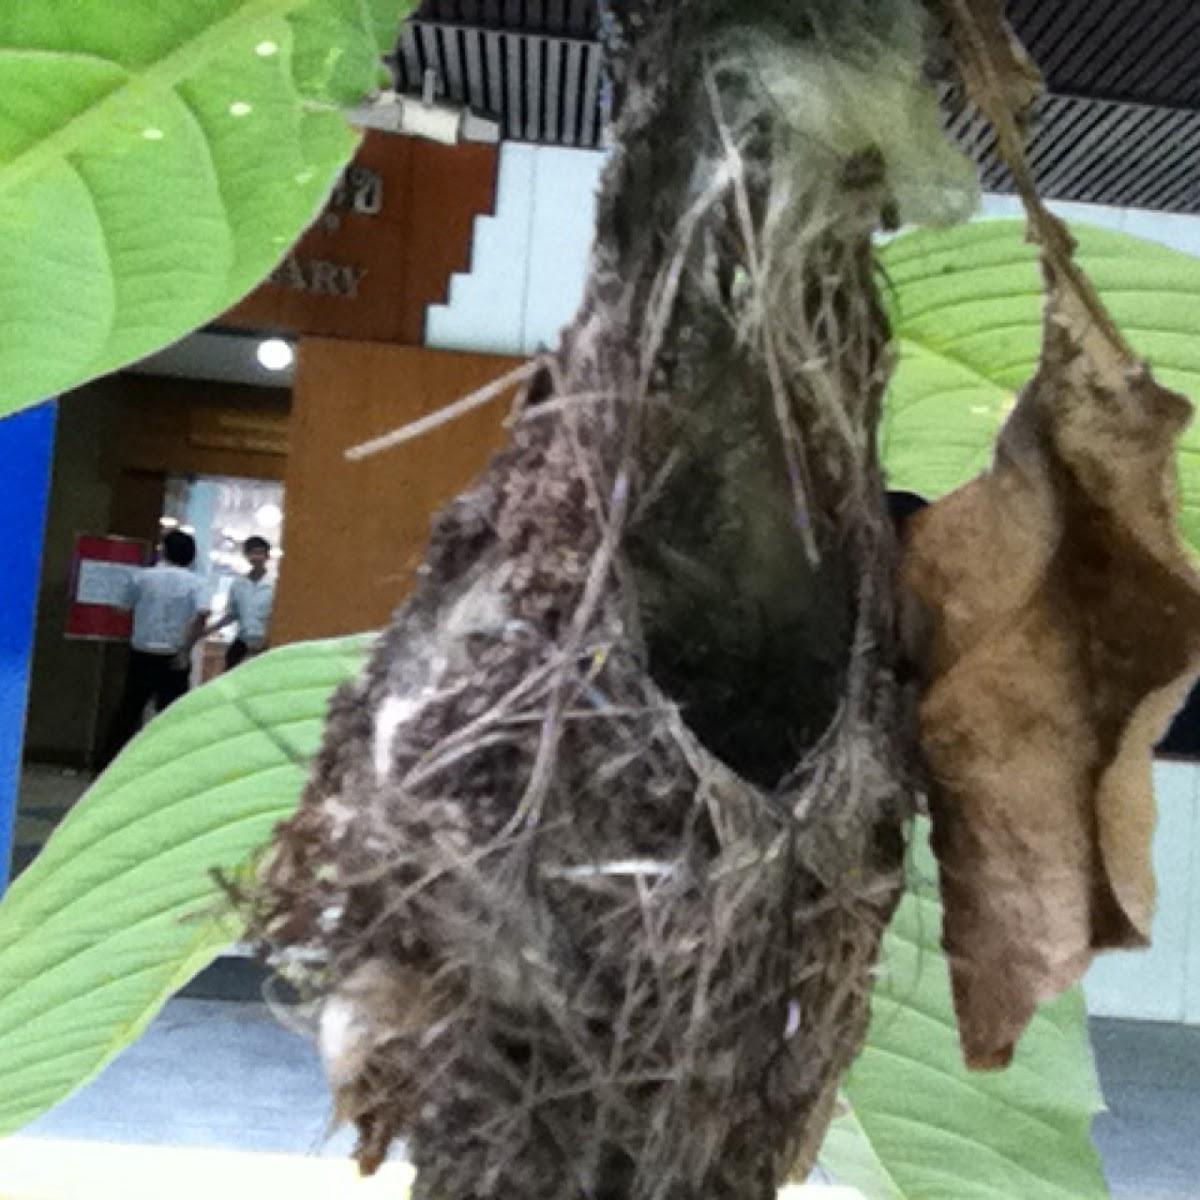 Olive-backed sunbird's nest